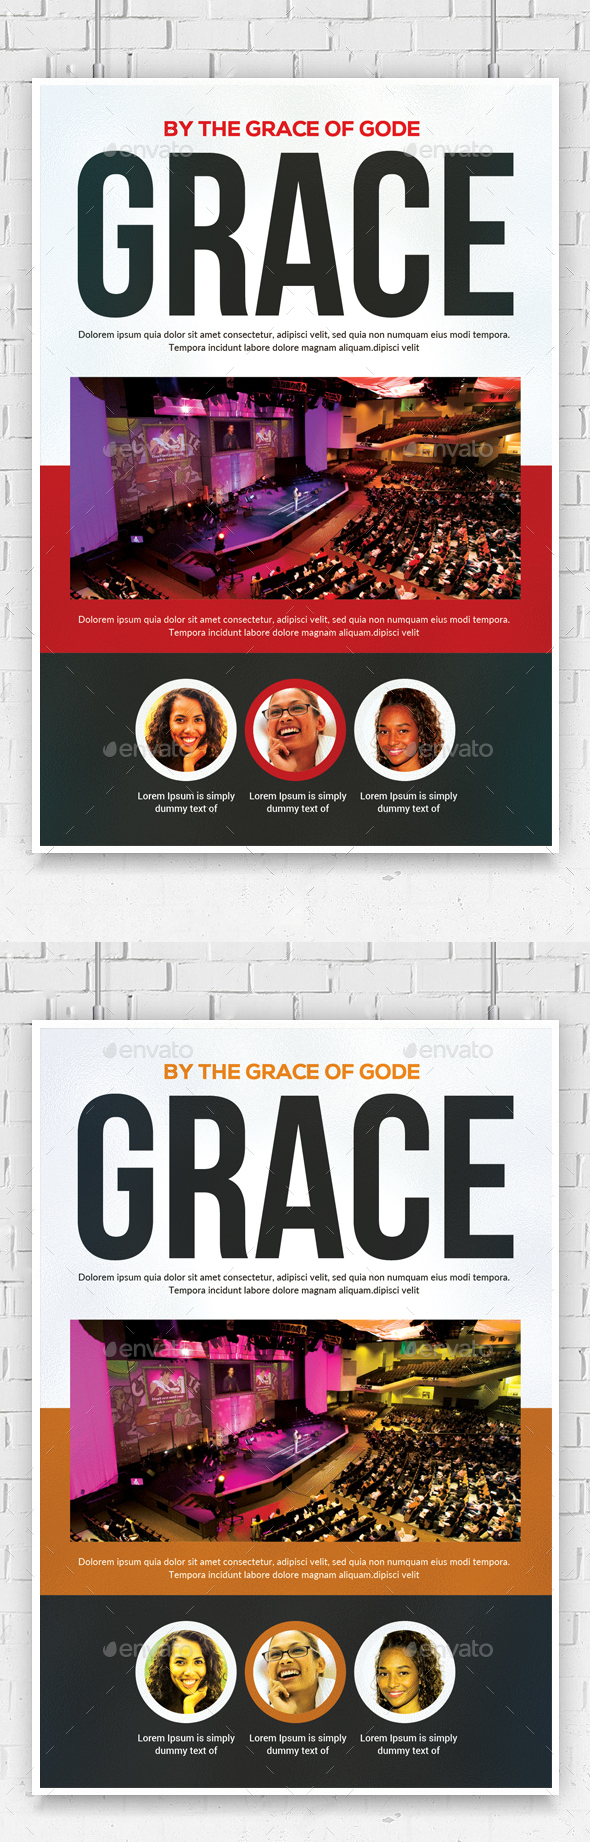 By The Grace of God Flyer Psd - Church Flyers